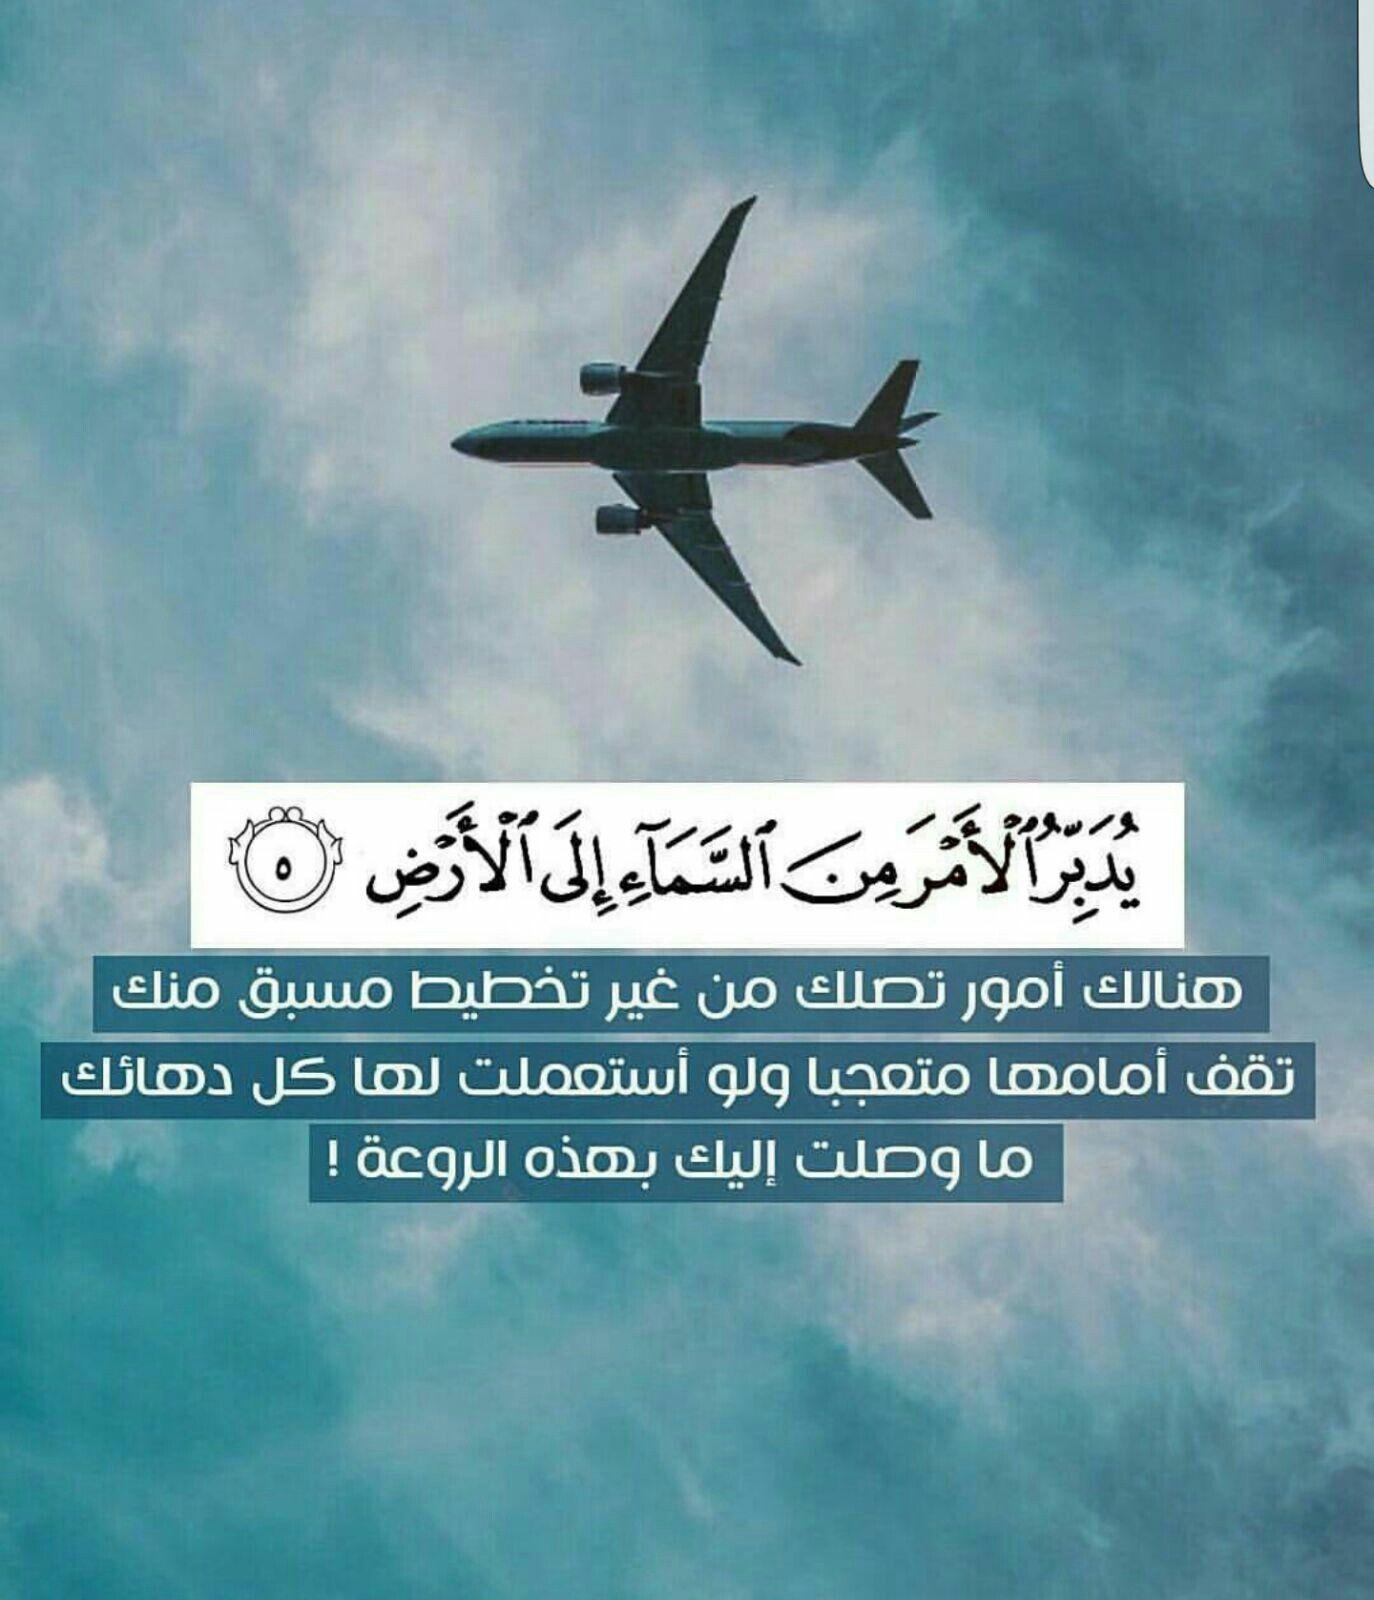 يدبر الامر Islamic Quotes Quran Quran Verses Quran Quotes